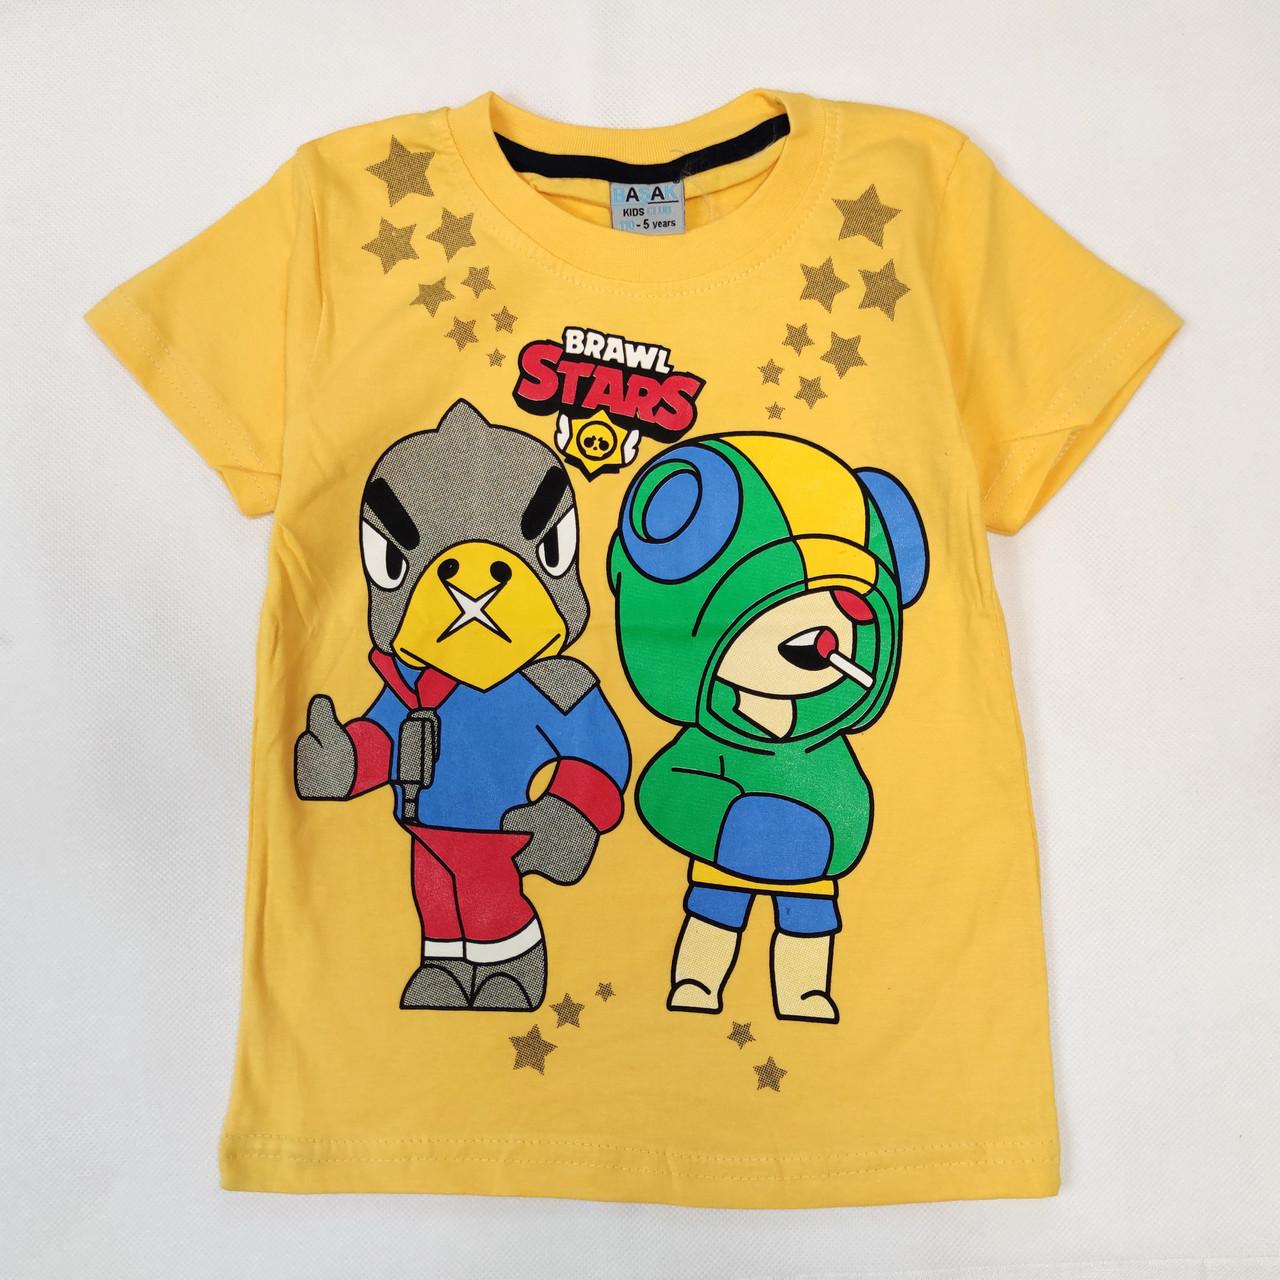 Детская футболка для мальчика бравл старс brawl stars желтая 4-5 лет